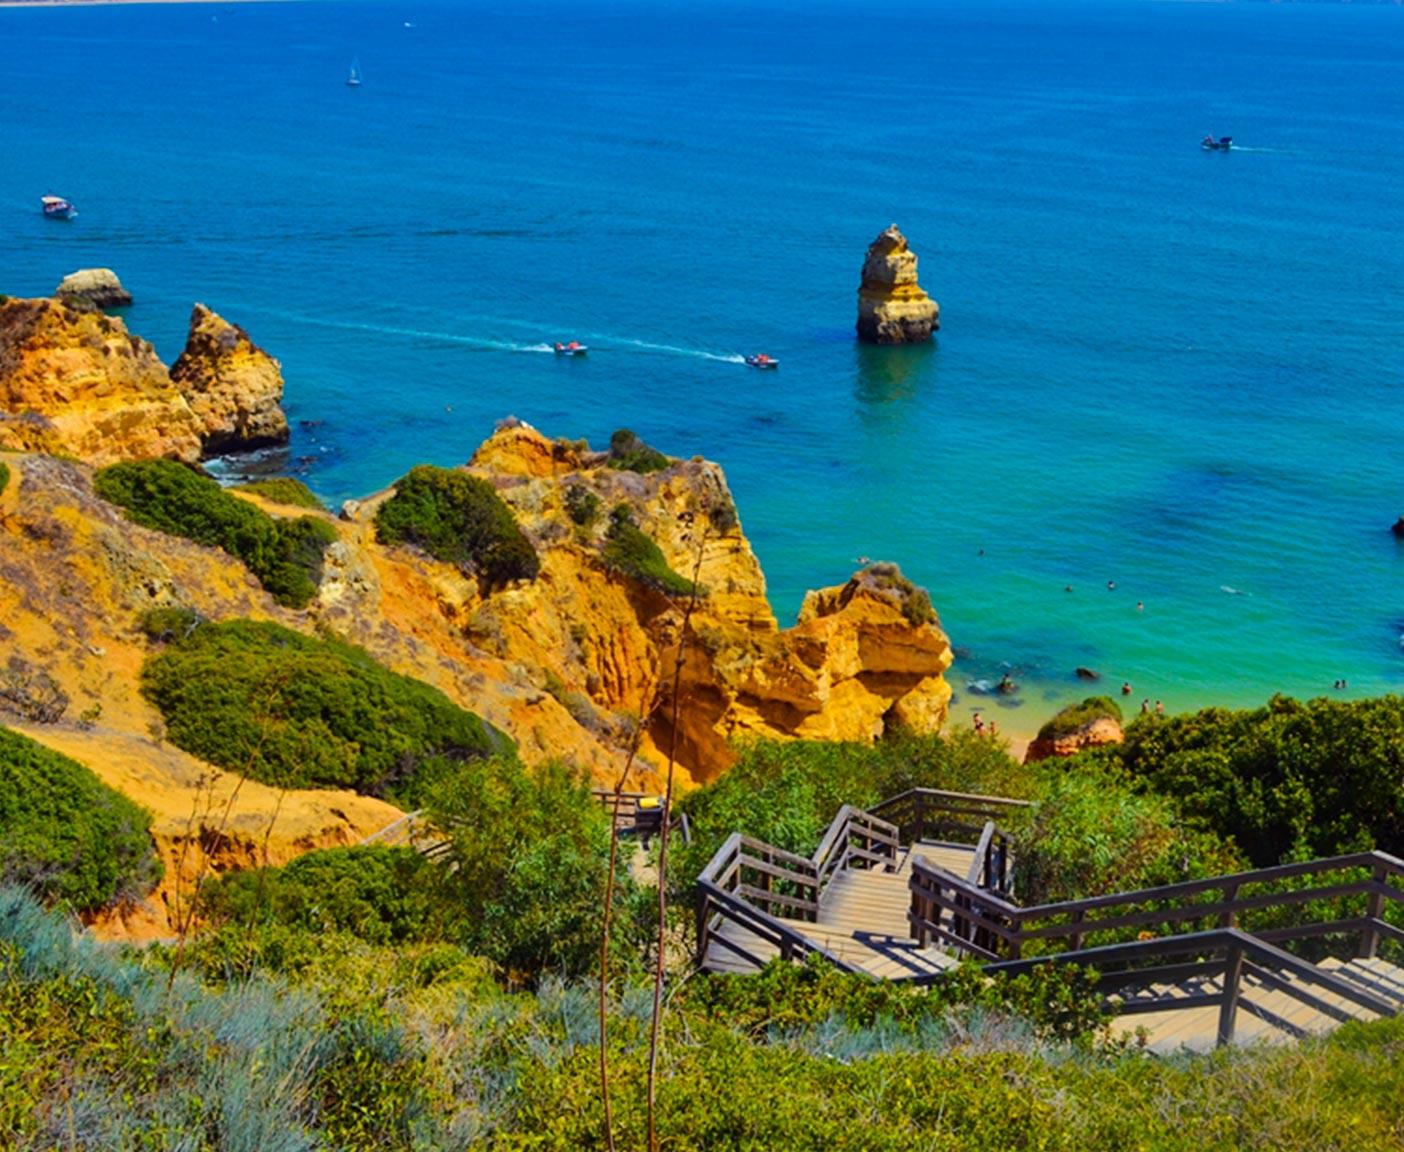 praia do camilo Algarve Portugal Reisefotografie Paulcamper